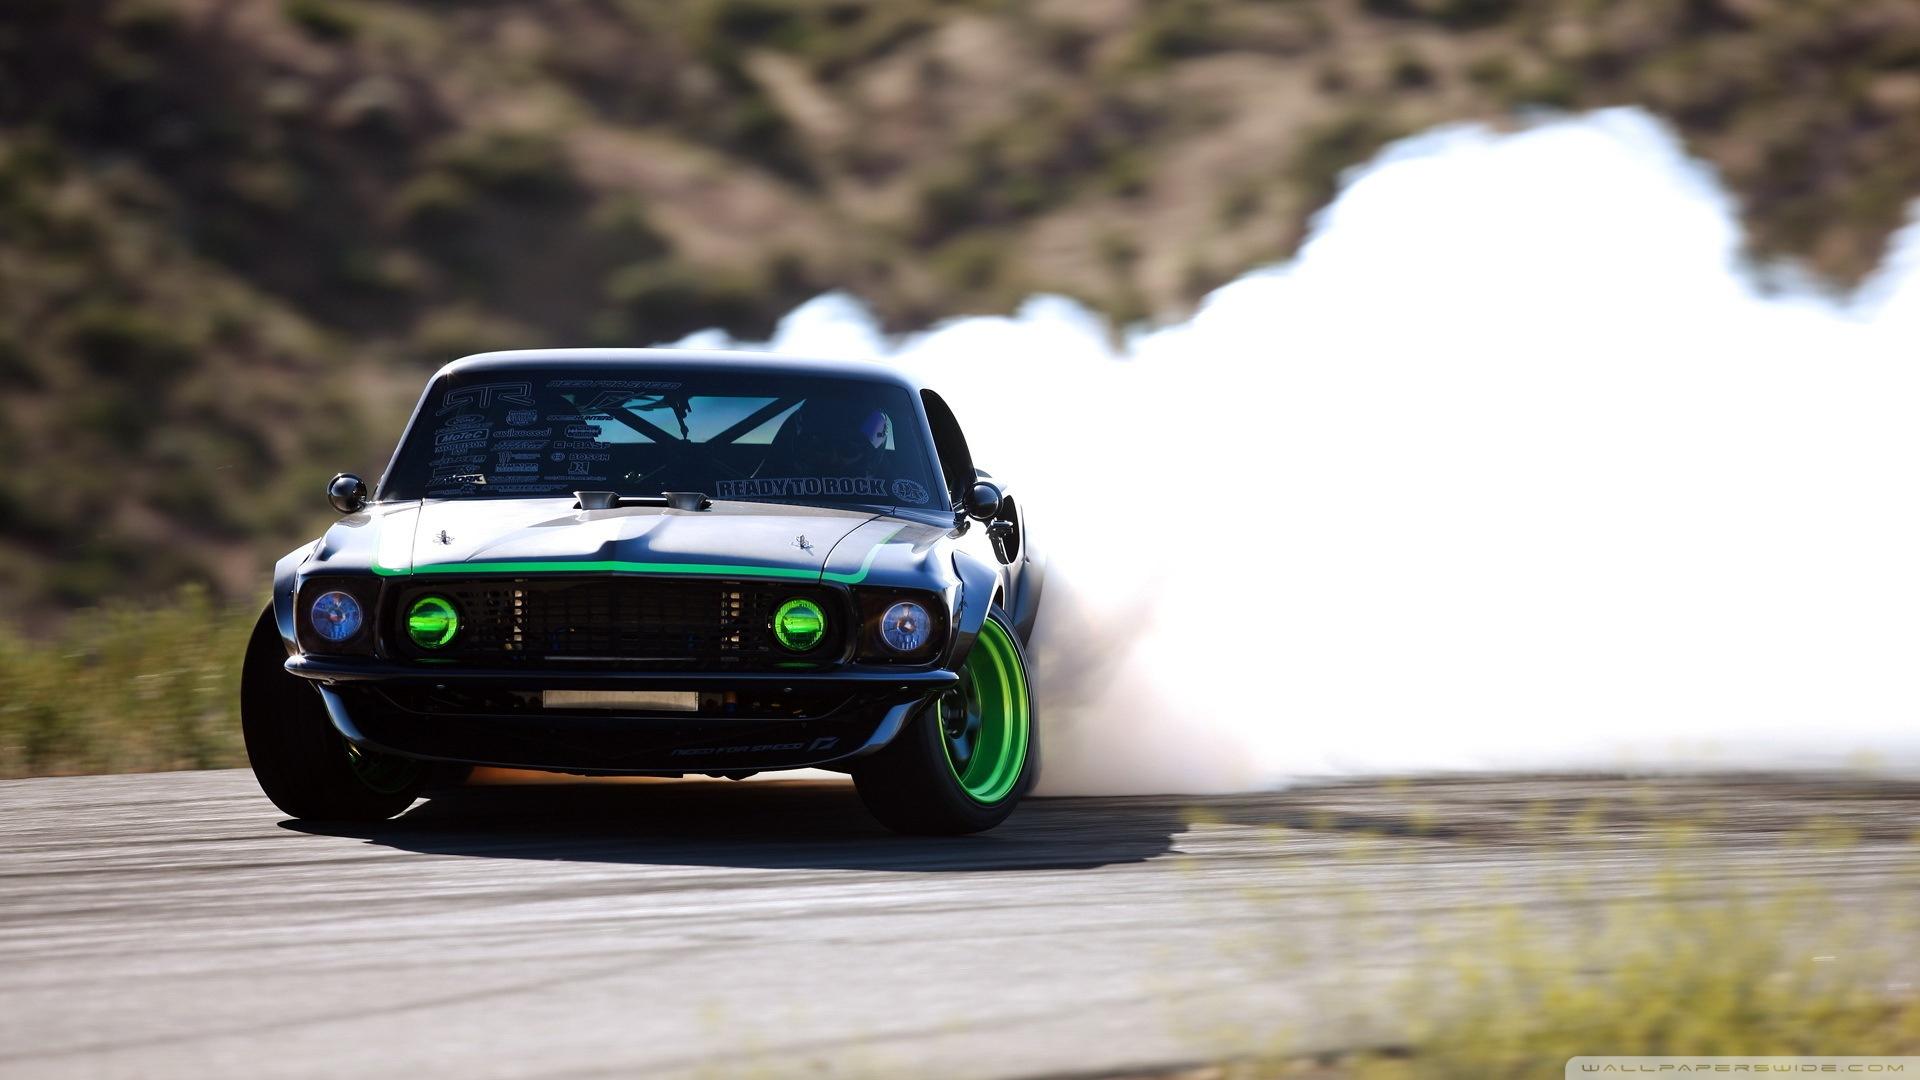 Download Ford Mustang Drifting Wallpaper 1920x1080 1920x1080